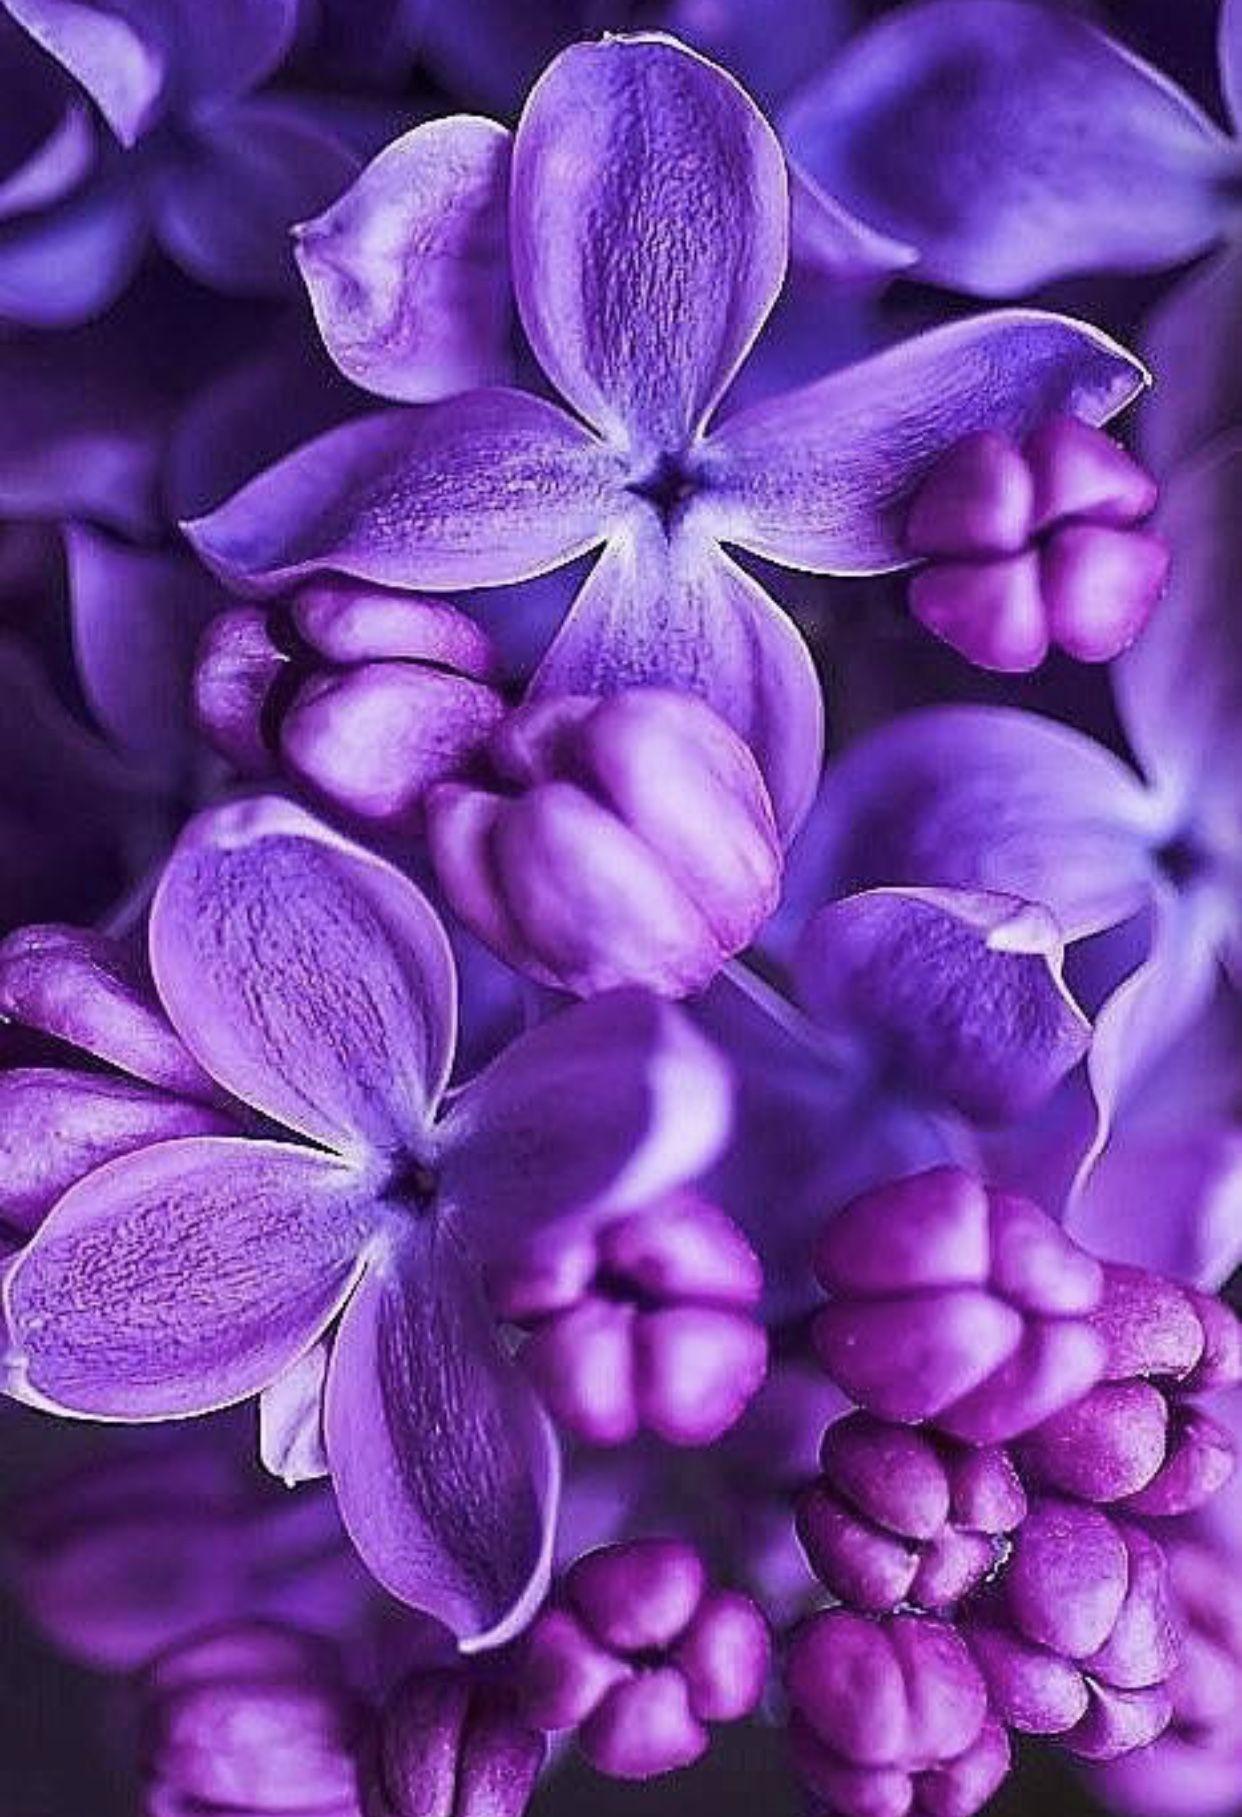 Pin By Lessya Lungu On Purple Purple Flowers Wallpaper Purple Flowers Light Purple Flowers Amazing light purple flower wallpaper